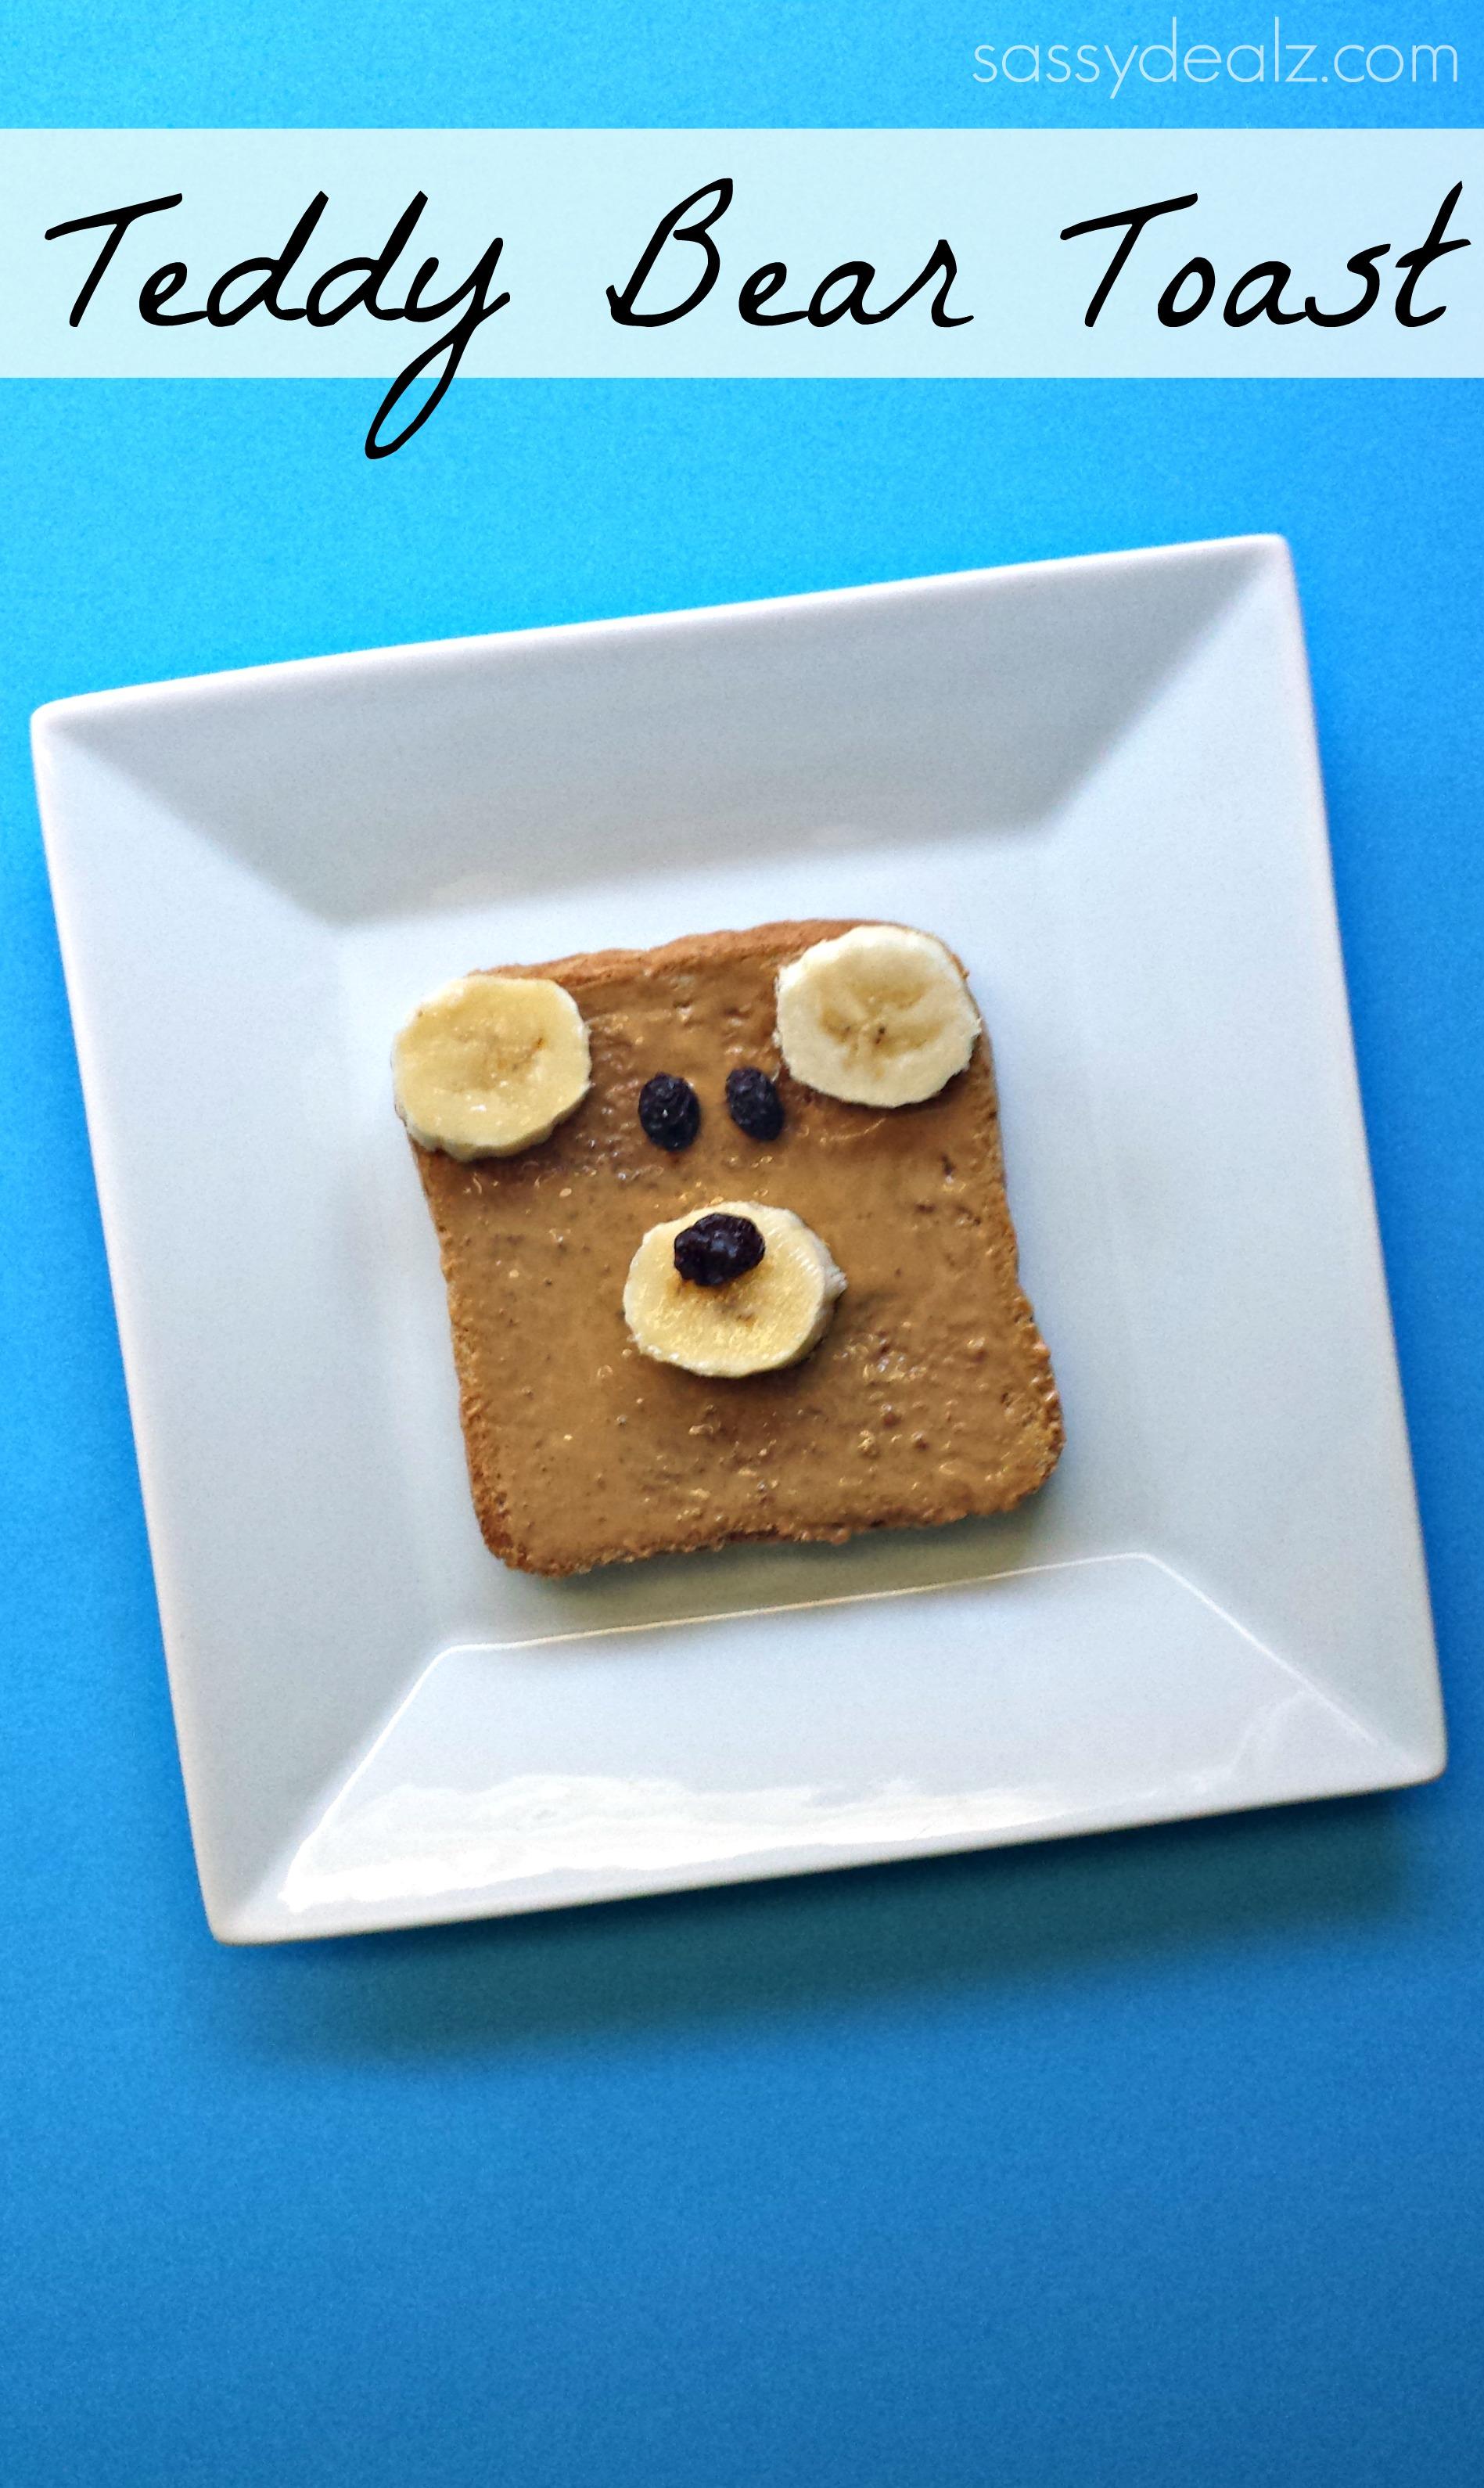 teddy bear toast healthy kid s breakfast idea crafty morning